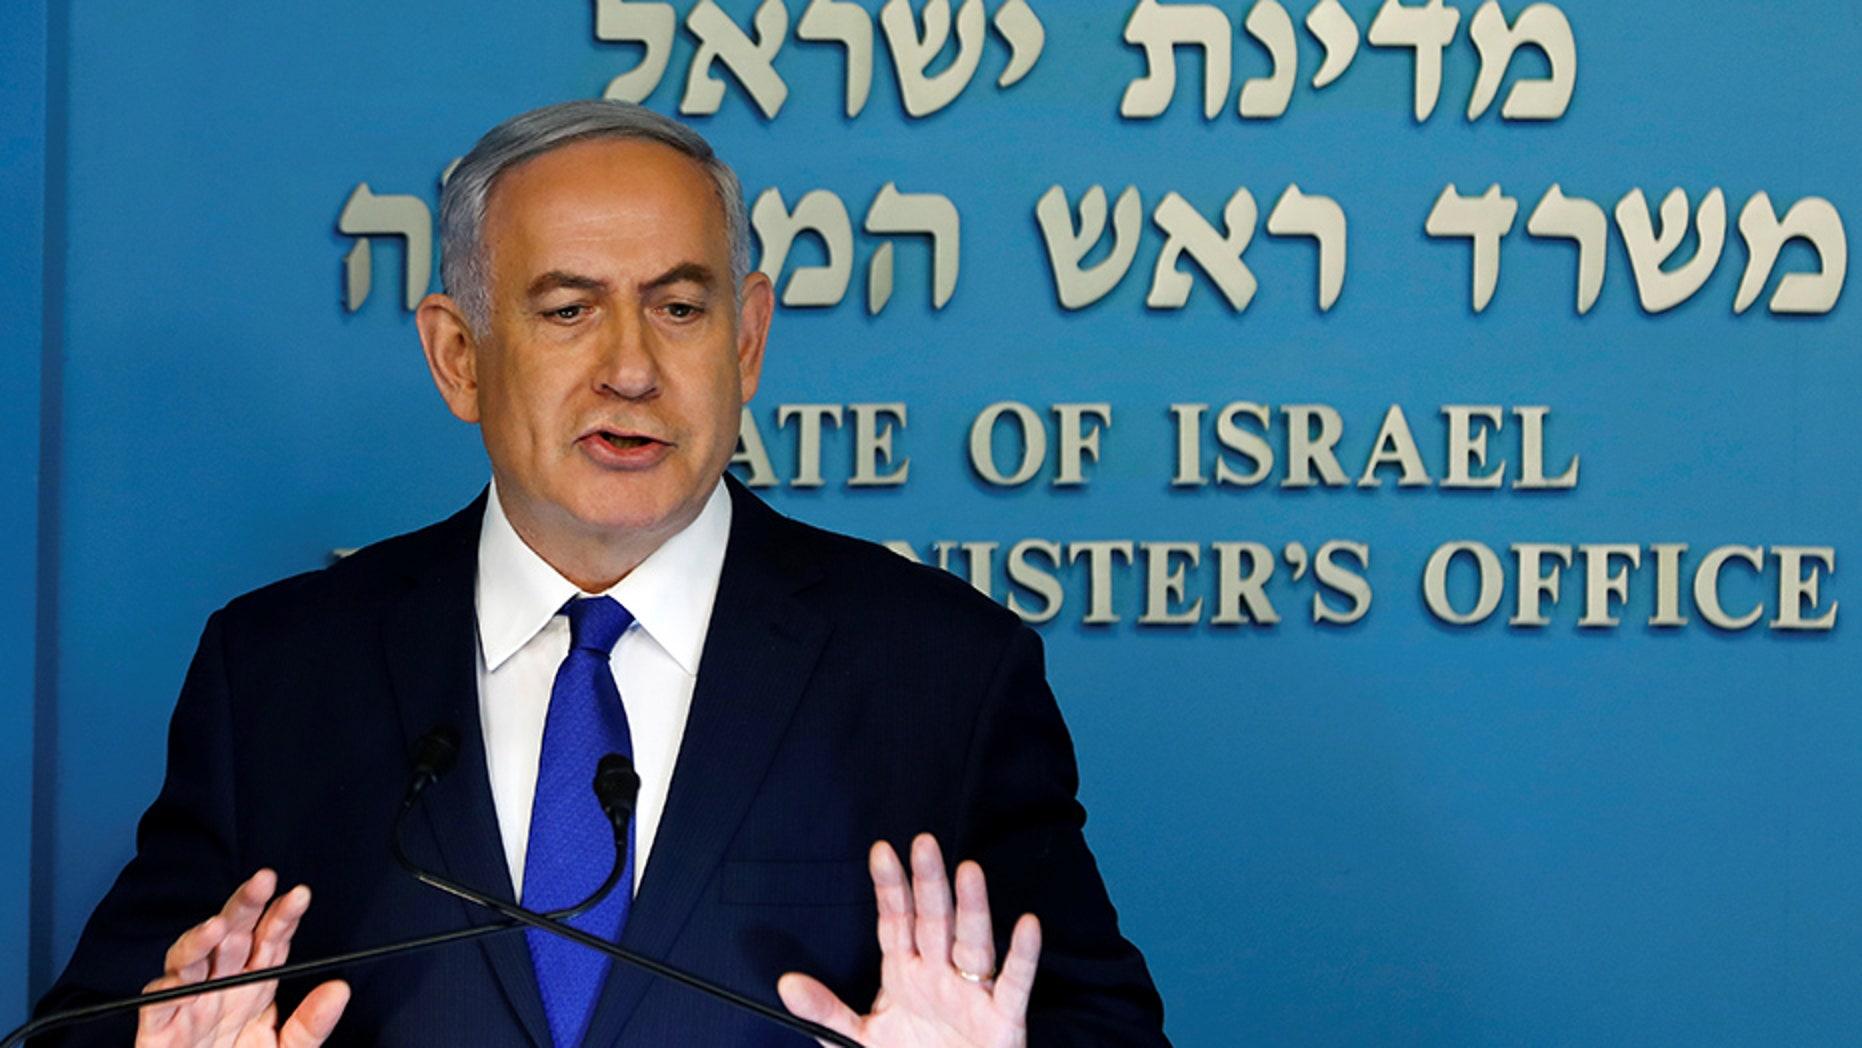 Israeli Prime Minister Benjamin Netanyahu speaks during a news conference in Jerusalem.